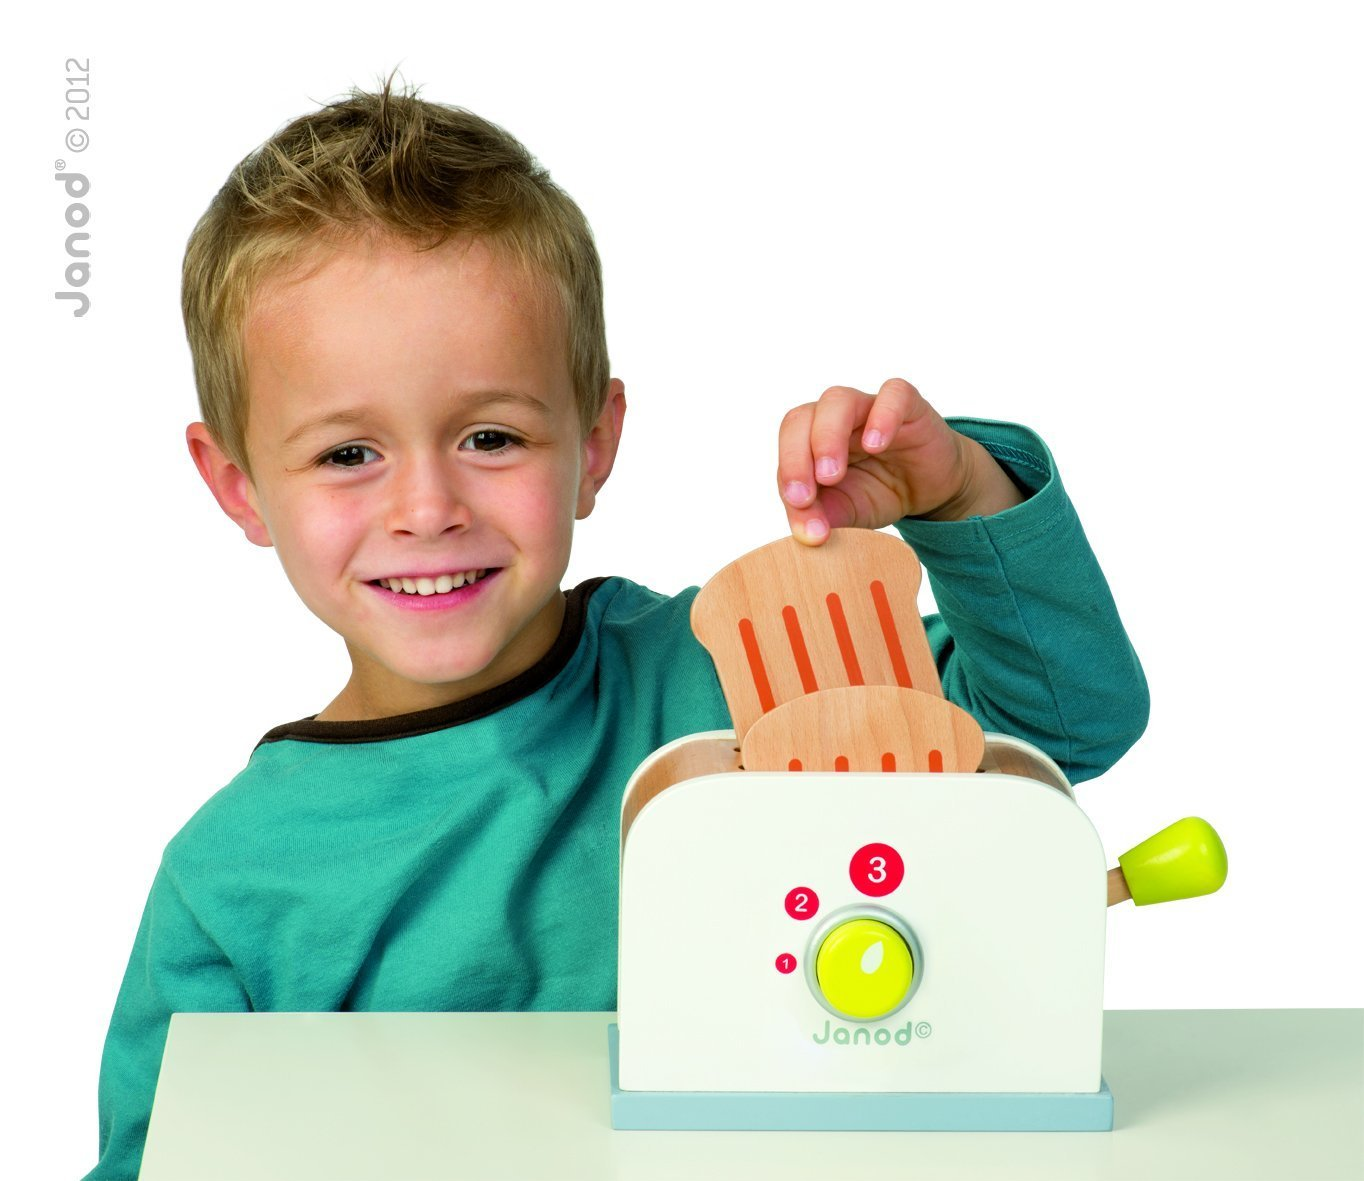 Janod: Picnik Toaster image